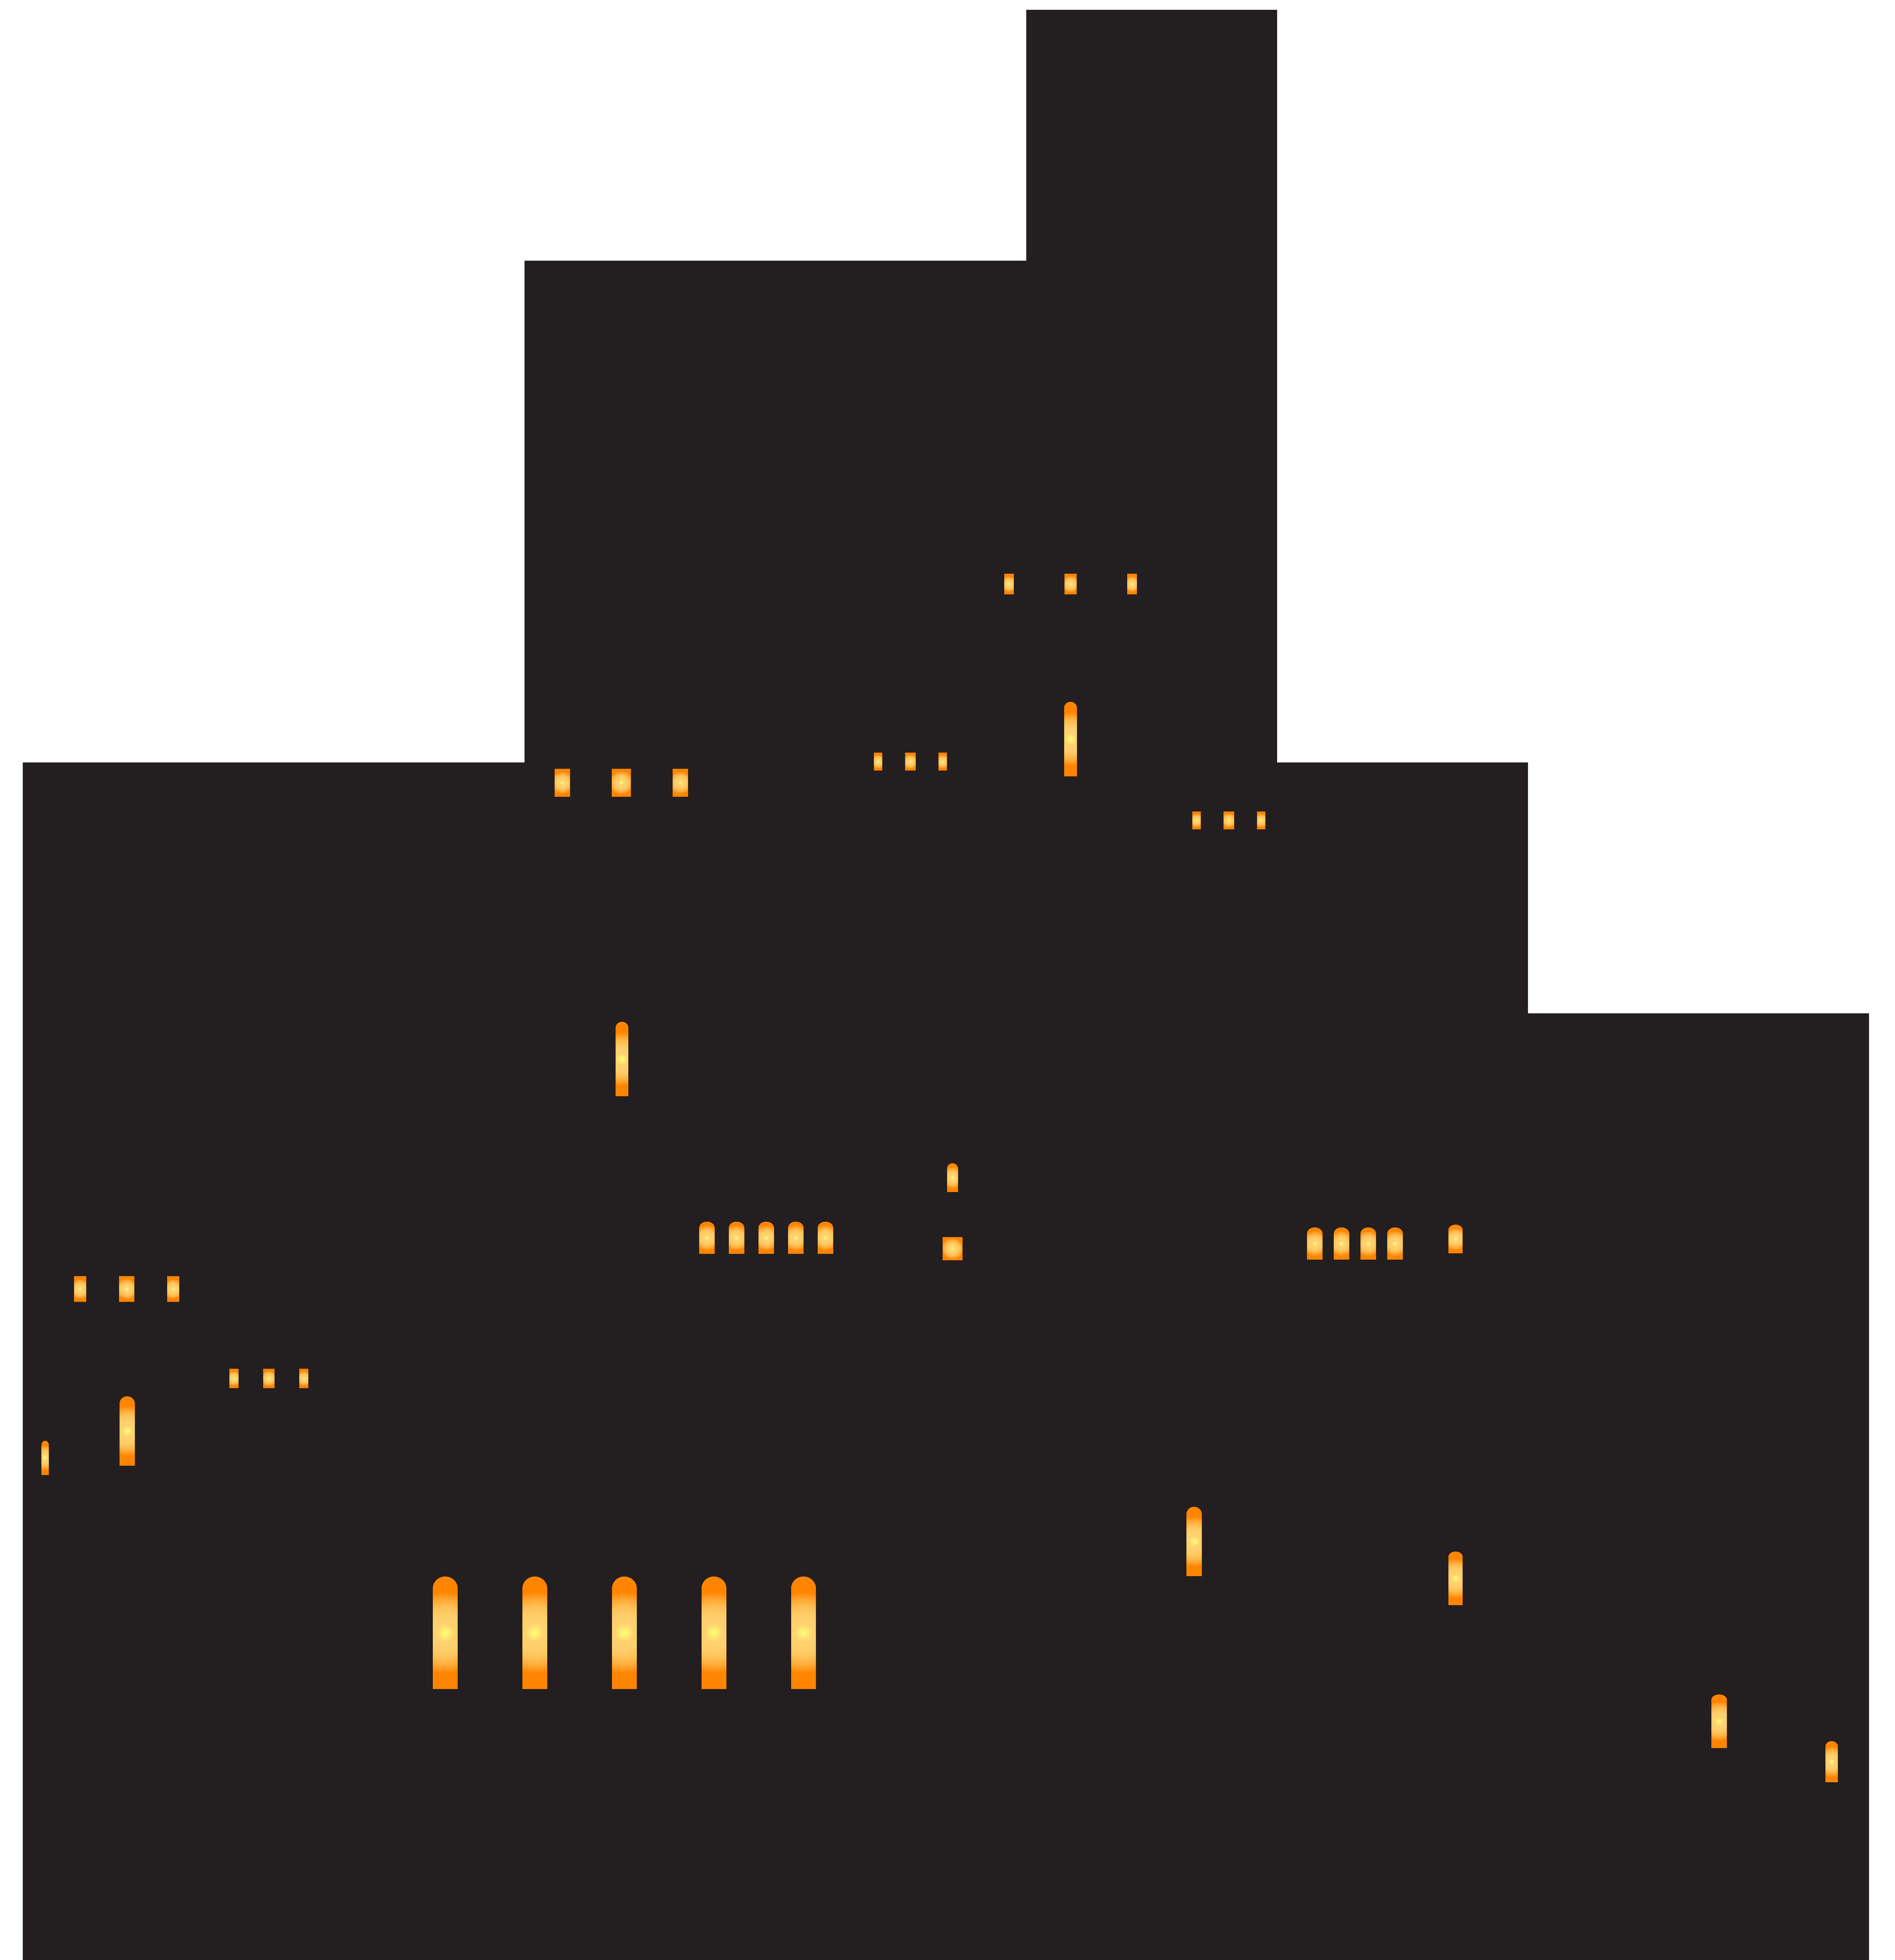 Hogwarts castle clipart jpg royalty free library Hogwarts castle clipart clipart images gallery for free ... jpg royalty free library